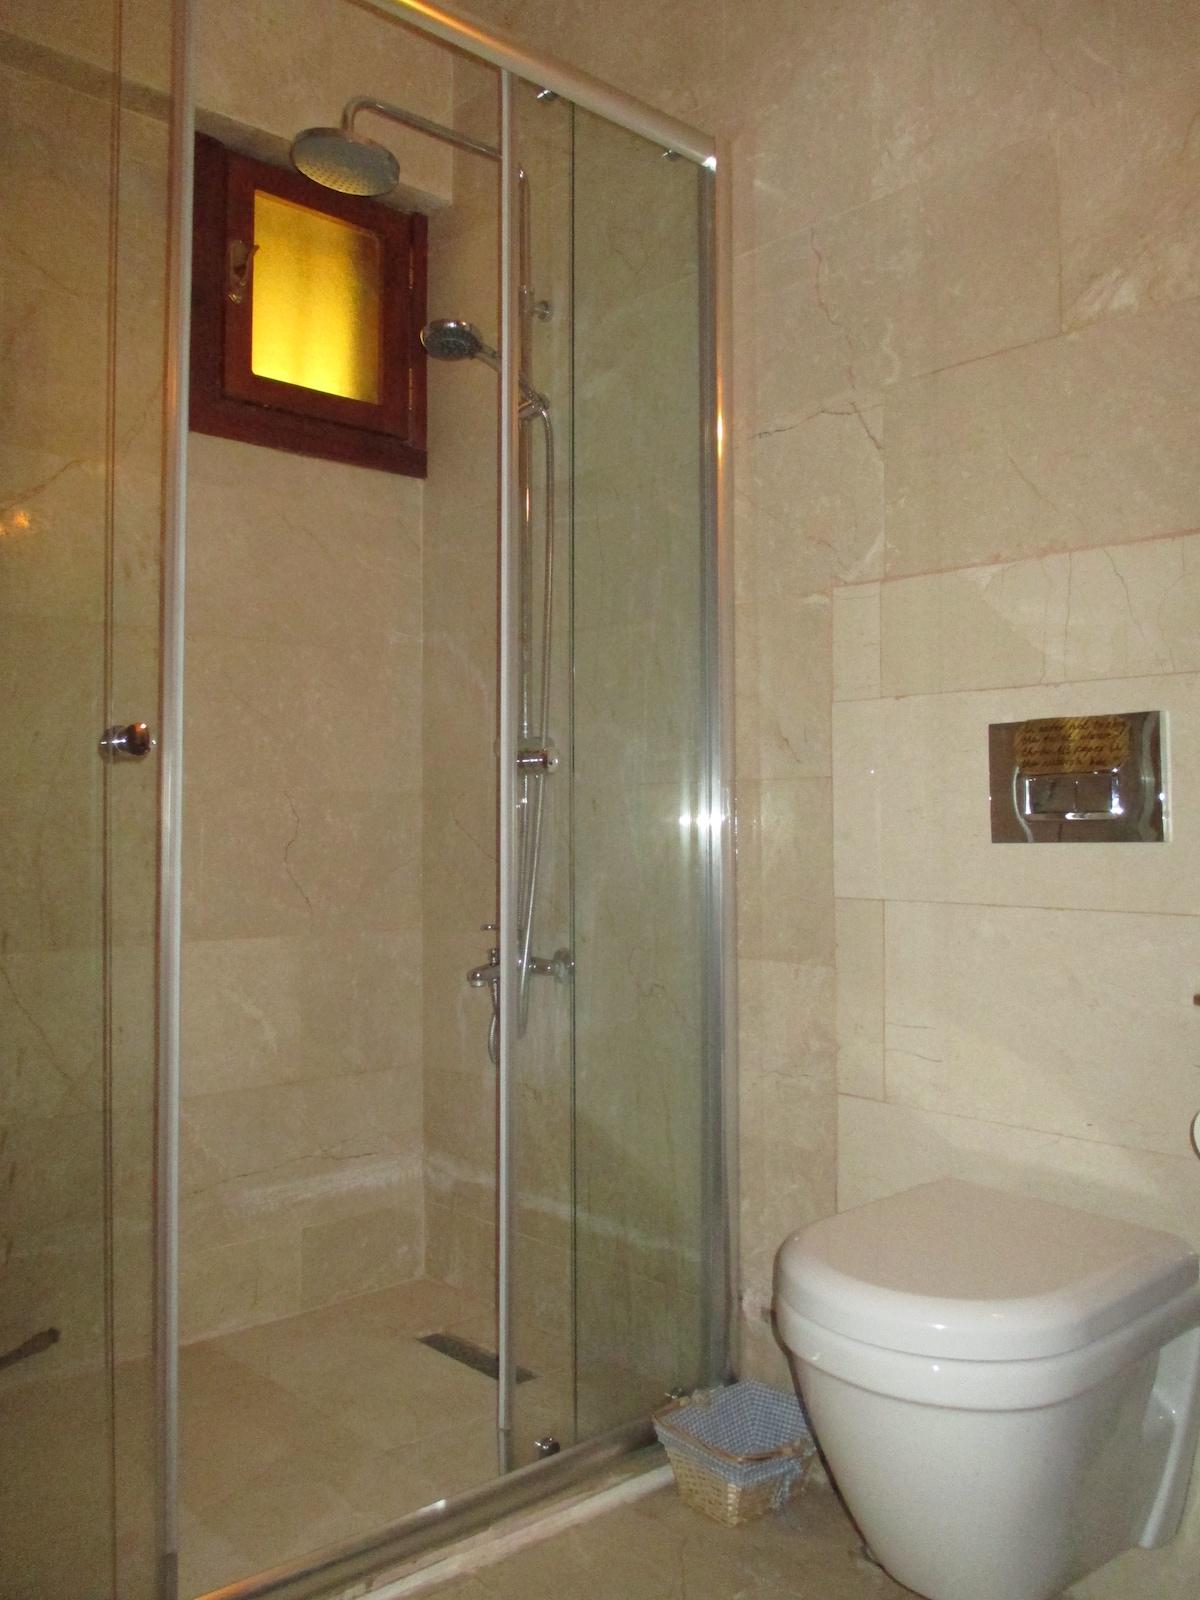 Brand new shower :)